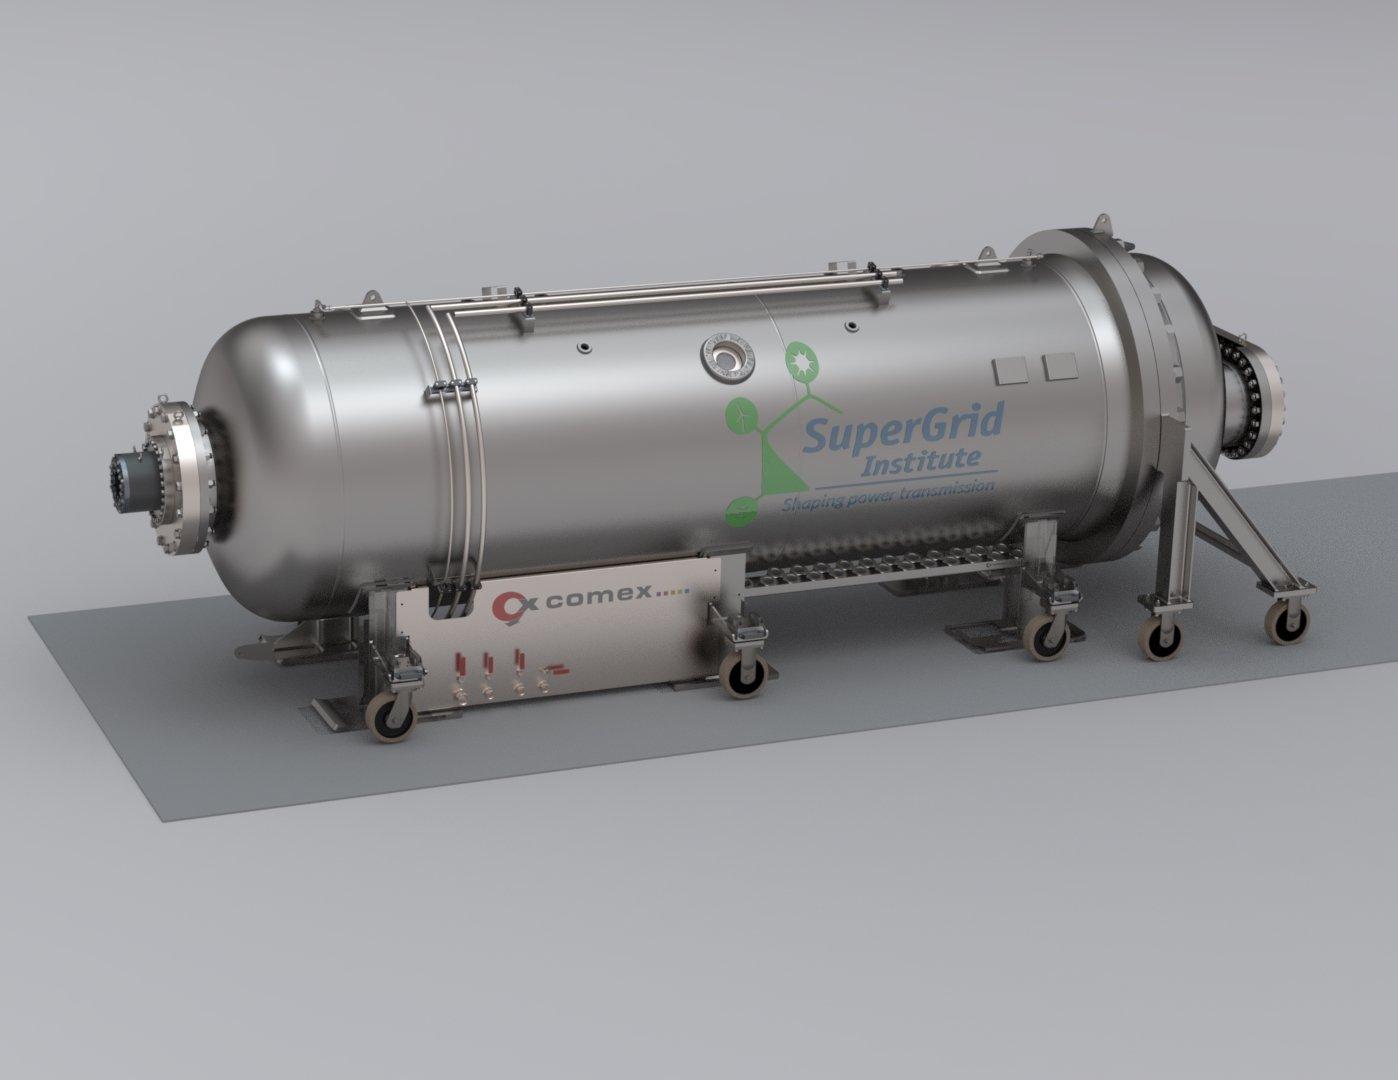 Hyperbaric test platform